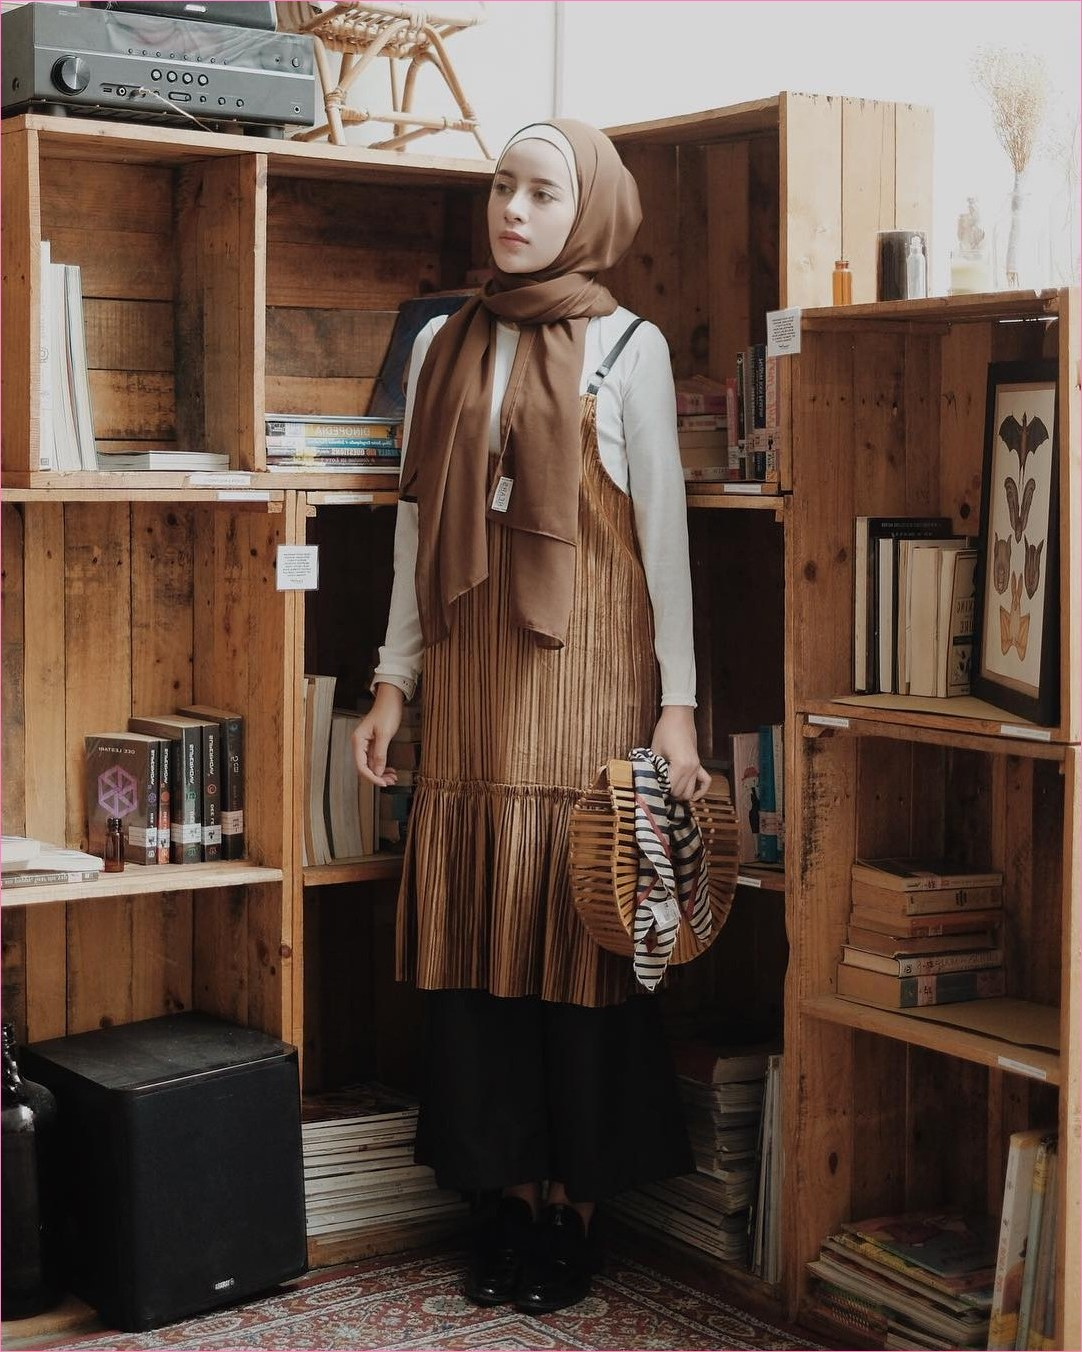 Inspirasi Contoh Baju Lebaran 2019 87dx 80 Model Baju Lebaran Terbaru 2019 Muslimah Trendy Model